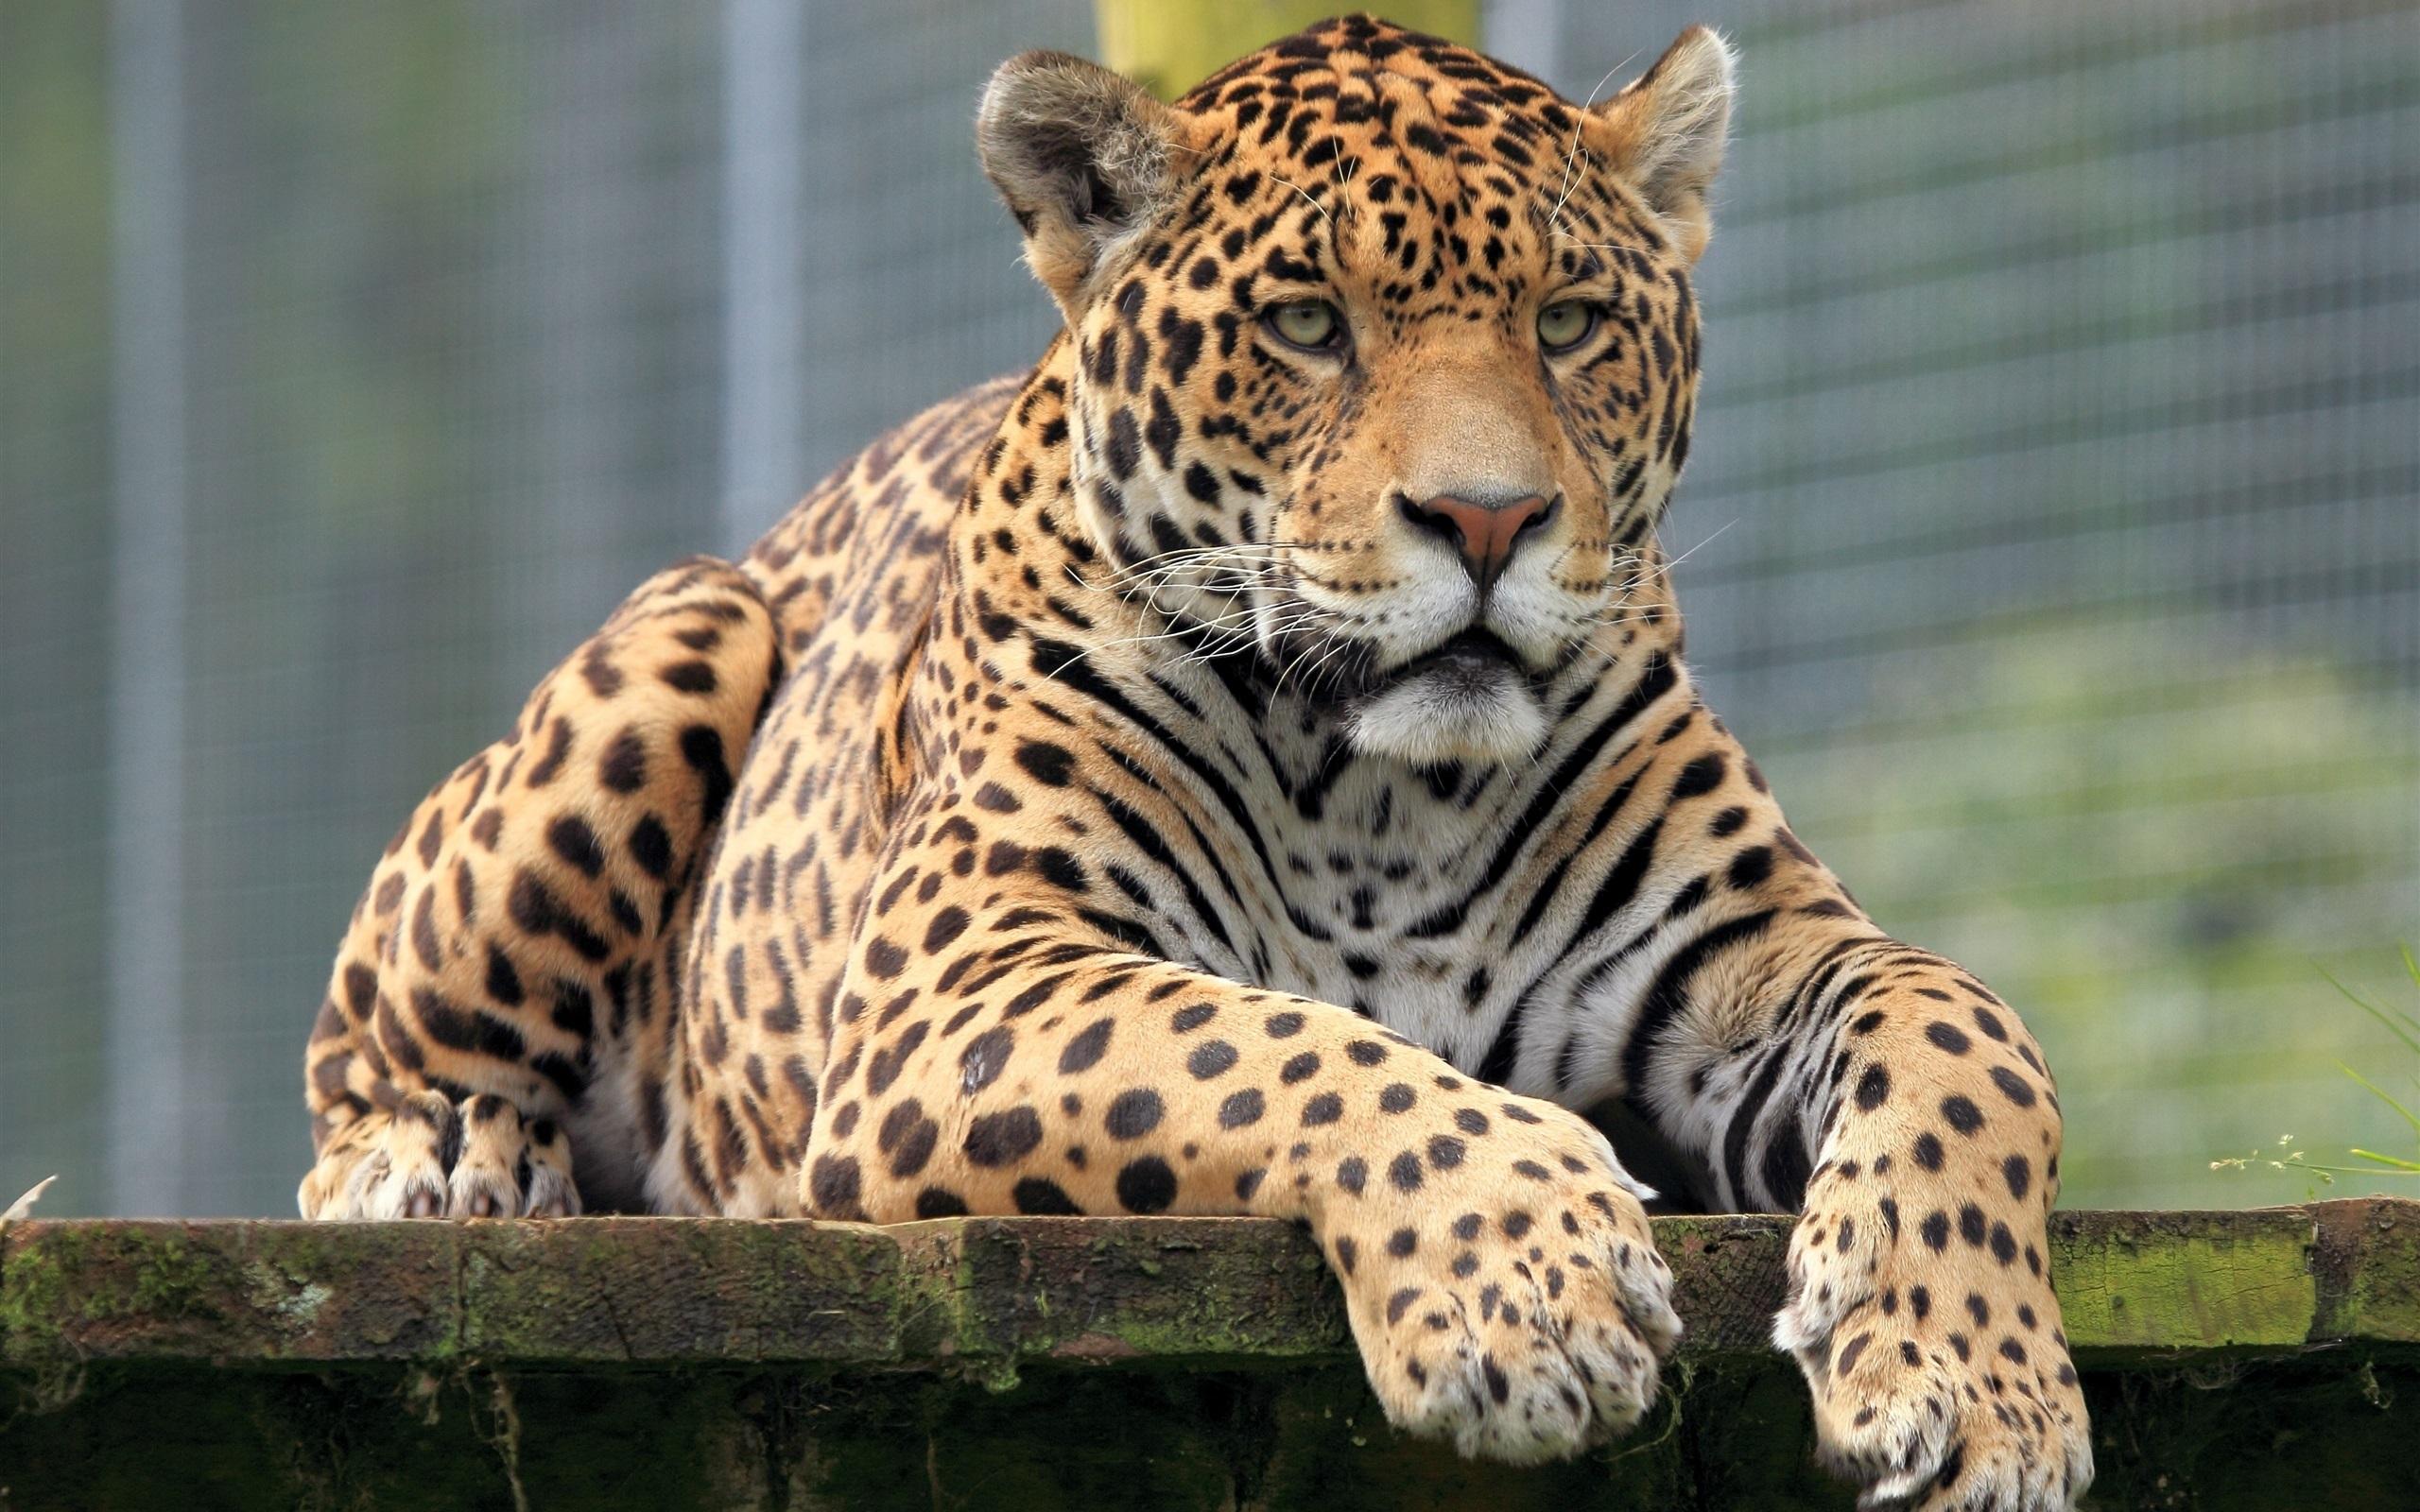 Wallpaper Animals Close Up Jaguar Front View 2560x1600 Hd Picture Image